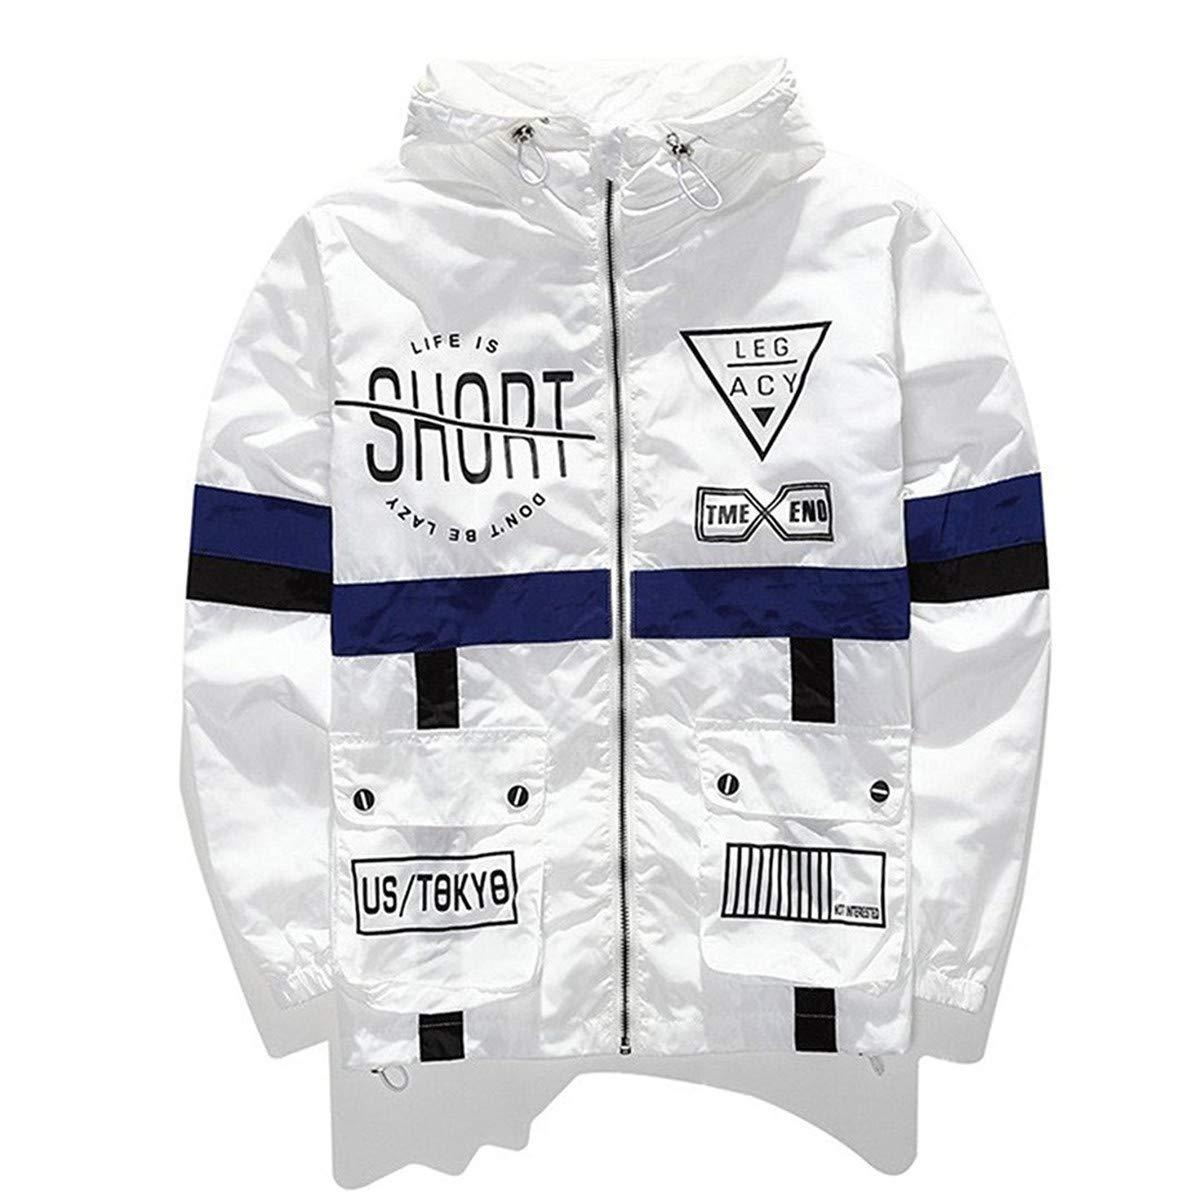 AITFINEISM Men's Fashion Lightweight Hooded Zip-up Letter Windbreaker Jacket (XX-Large, White) by AITFINEISM